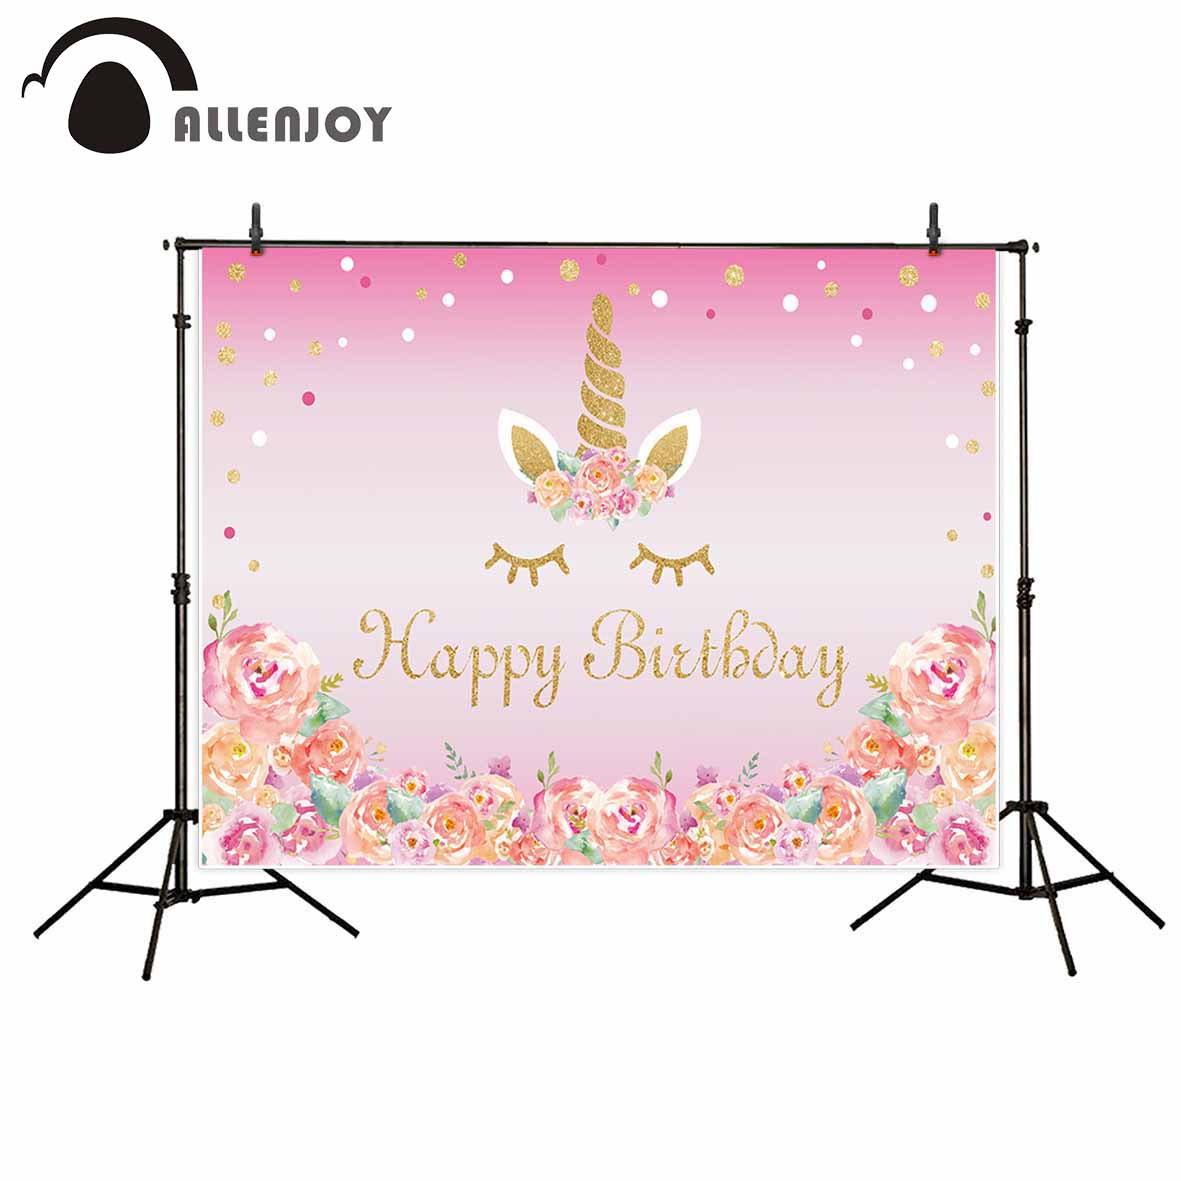 Allenjoy new photographic background Beautiful girl flower pink birthday unicorn backdrop photocall professional customize